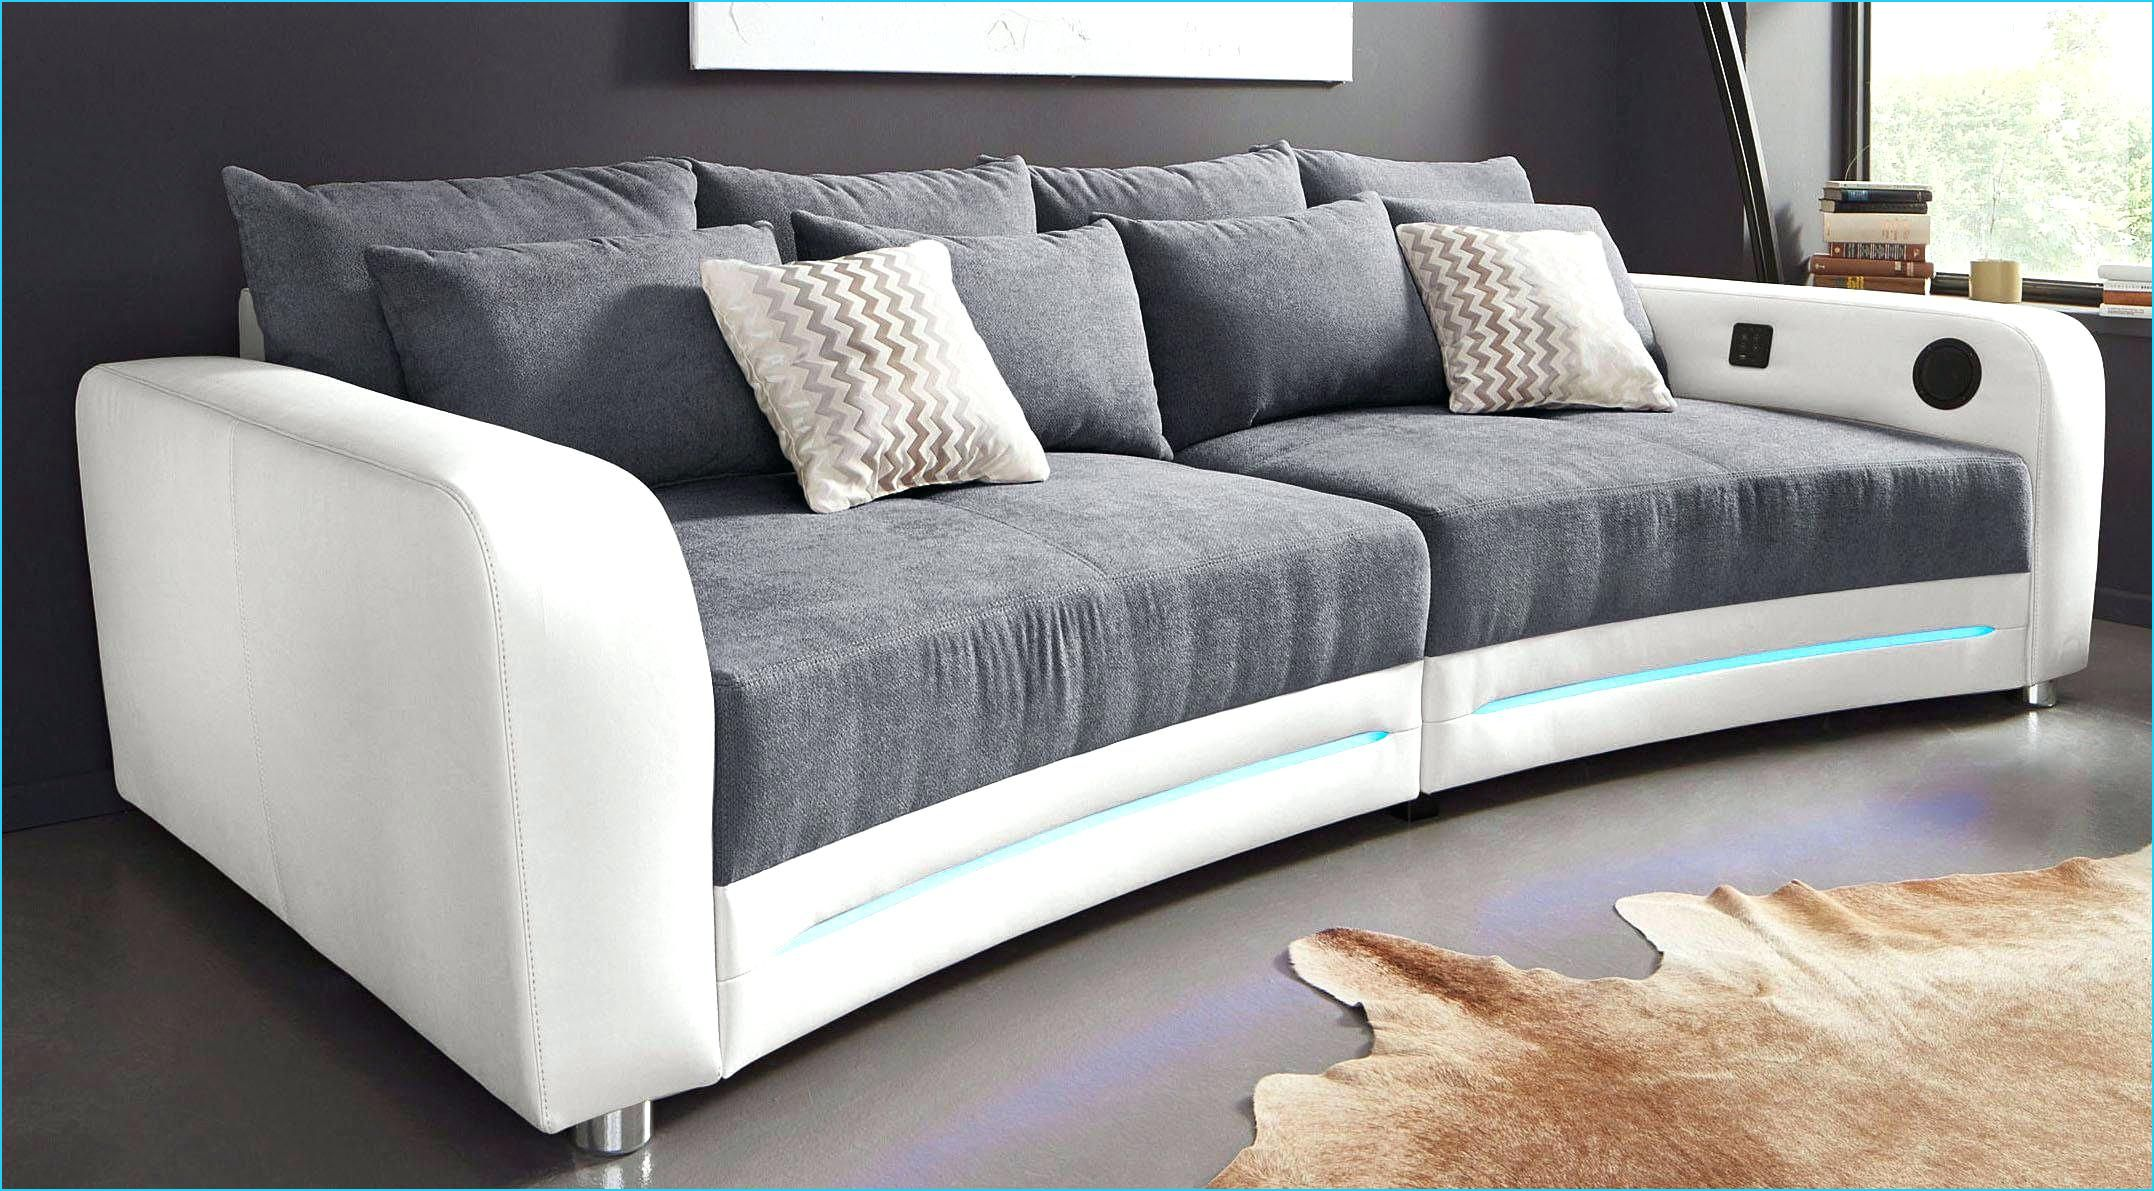 Schlafsofa Mit Led Kafen Sofa Leder Braun Antik Rot Gunstig Schwarz Modern Schlafsofamitmatratze140x In 2020 Living Room Trends Furniture Interior Design Living Room